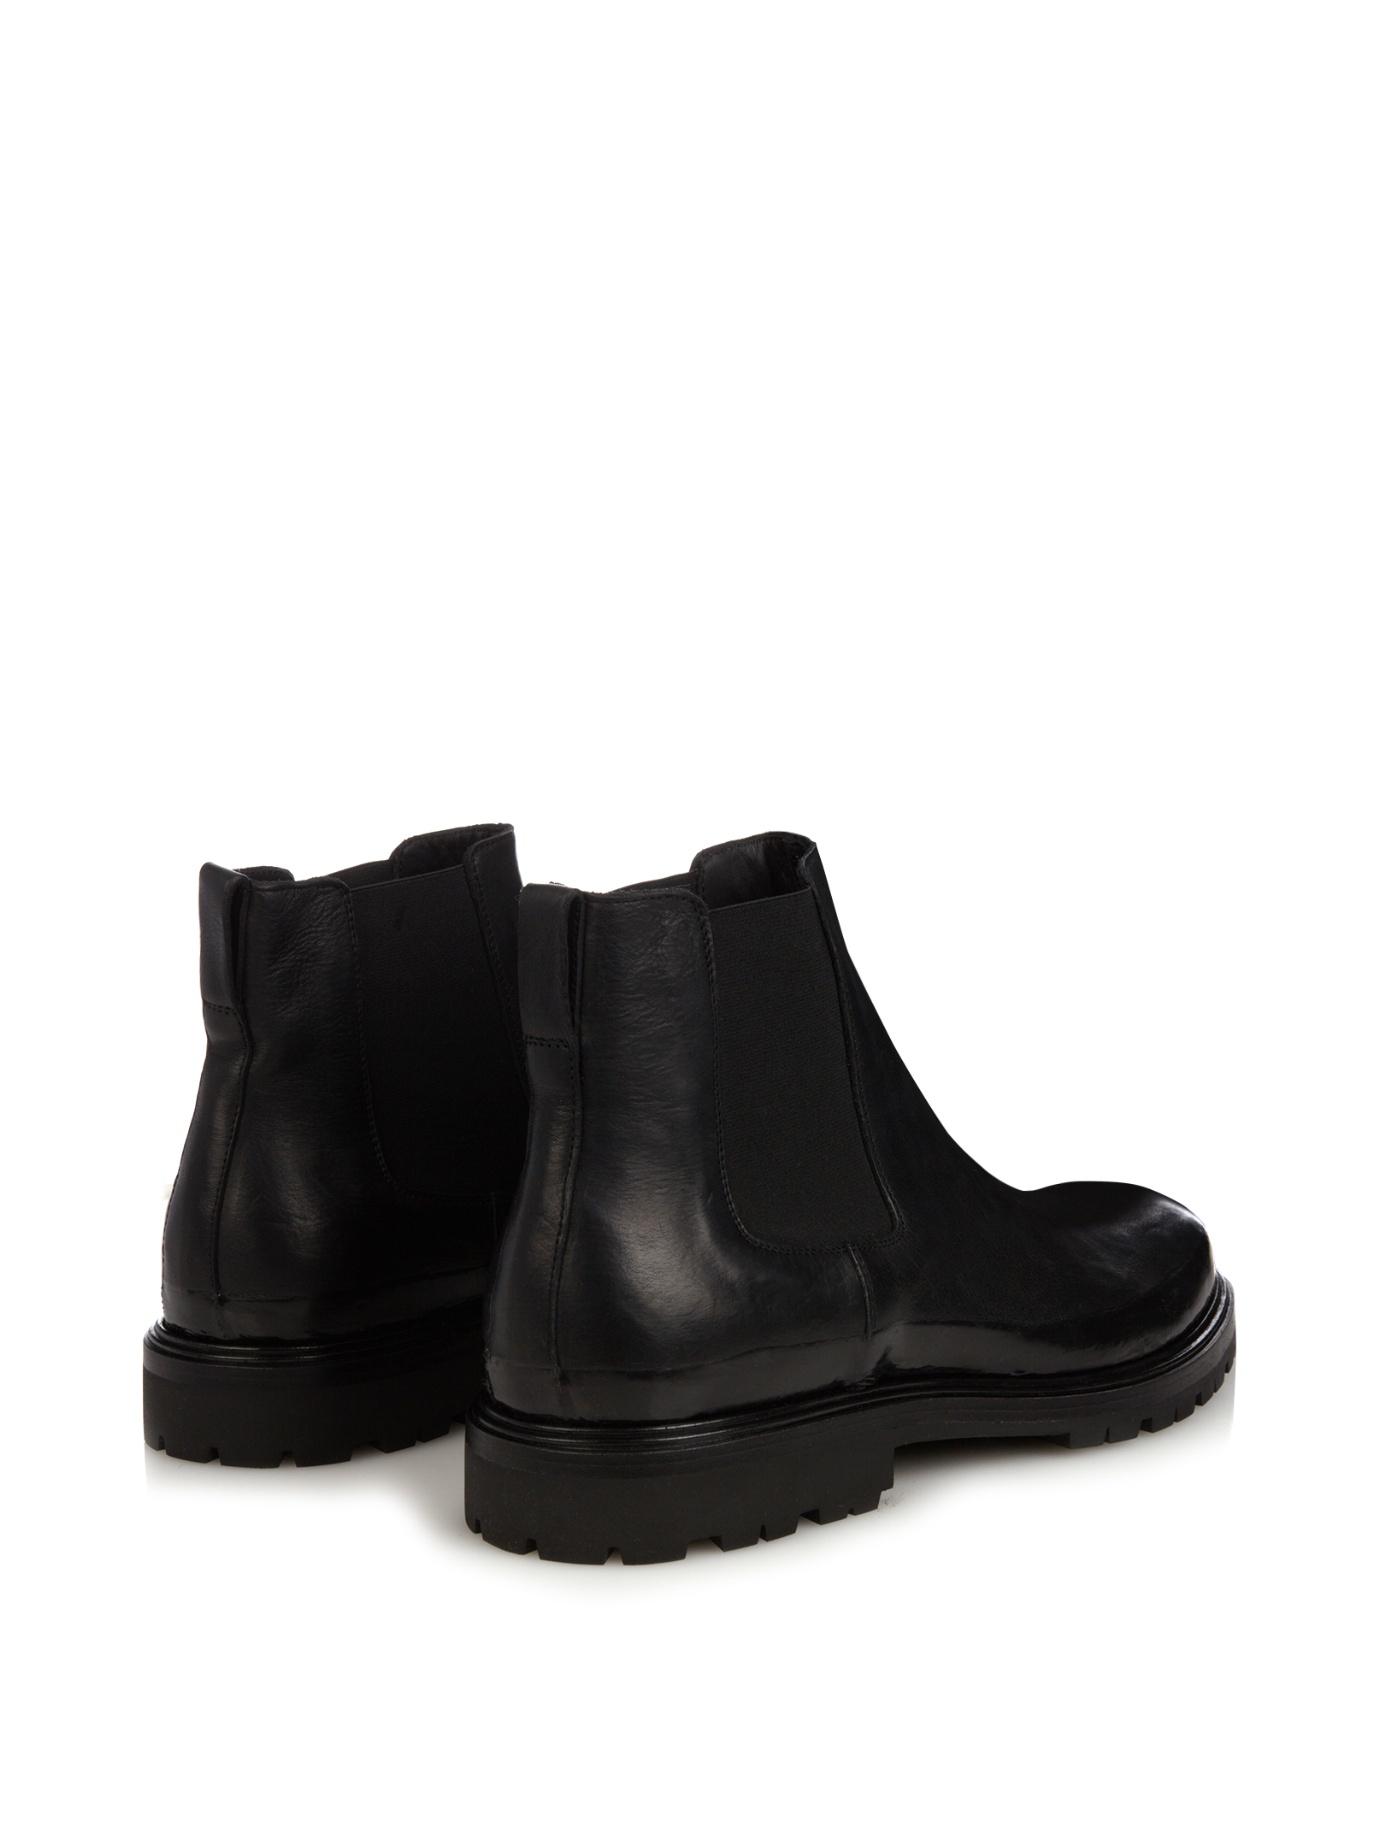 Simple Bottega Veneta Suede Chelsea Boots In Natural For Men  Lyst